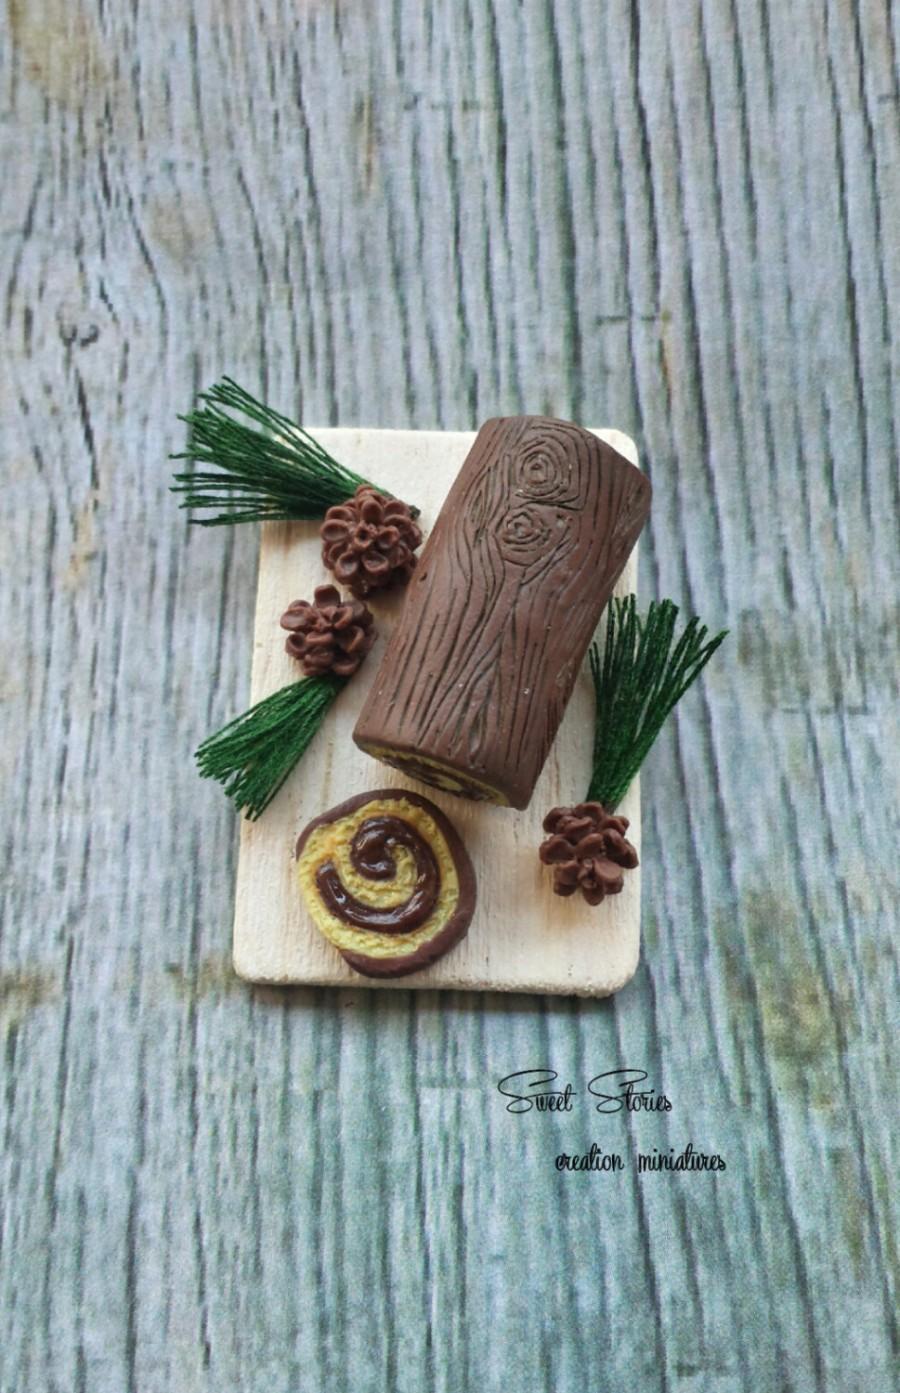 Wedding - Christmas dollhouse miniature swiss roll cake - 1:12 Scale Dollhouse Miniature Food - Dollhouse Yule log cake